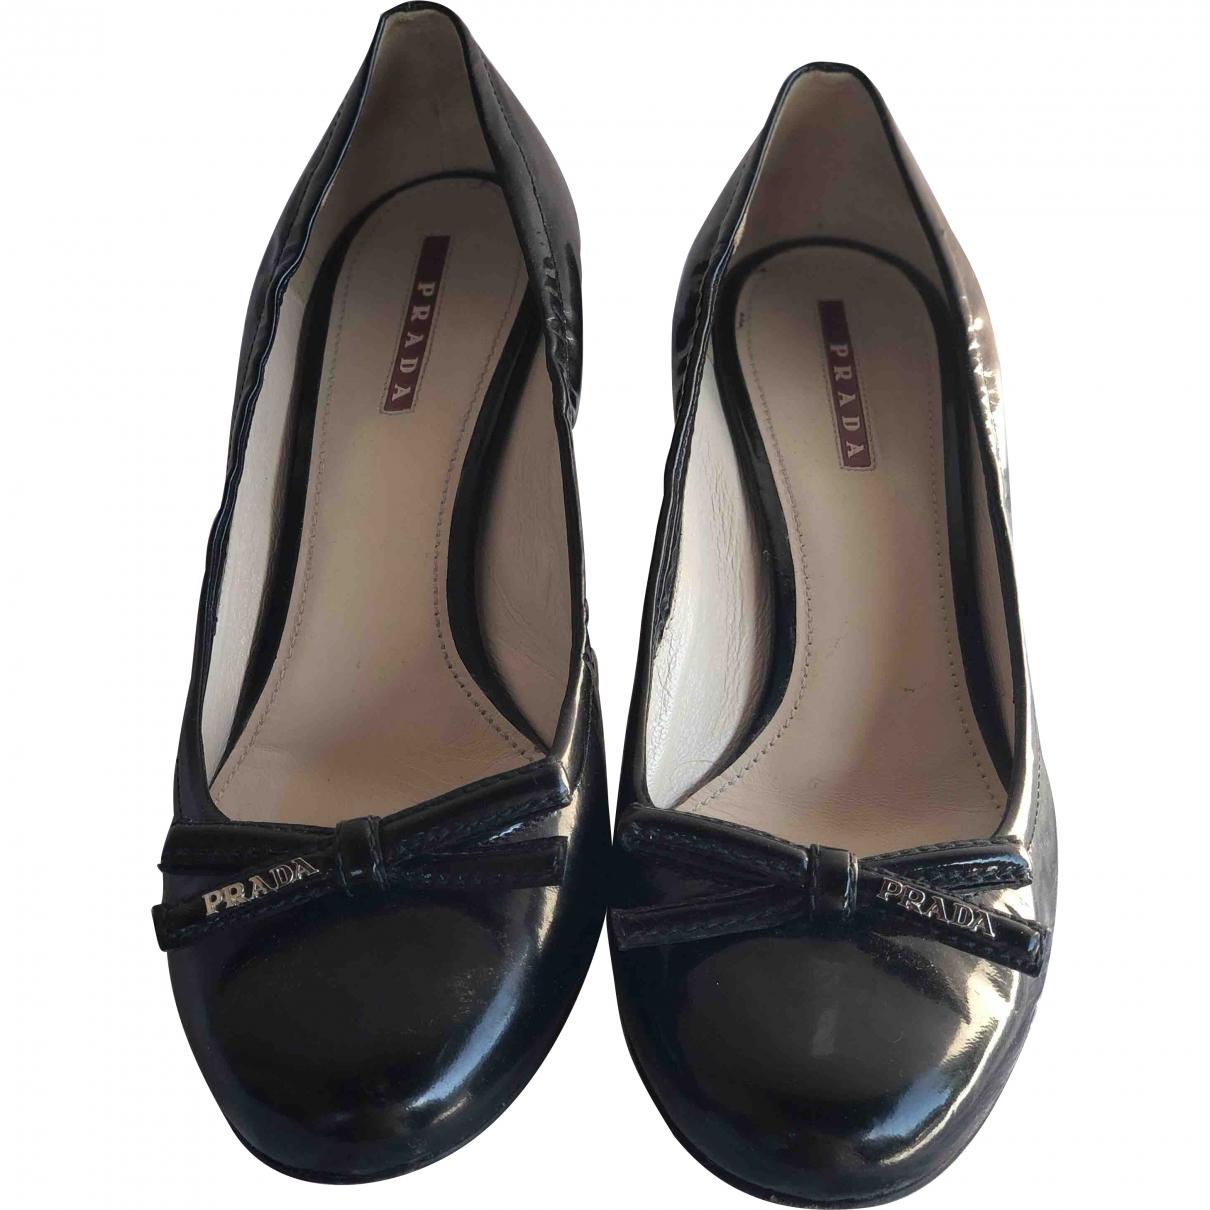 Prada \N Black Patent leather Heels for Women 40 EU